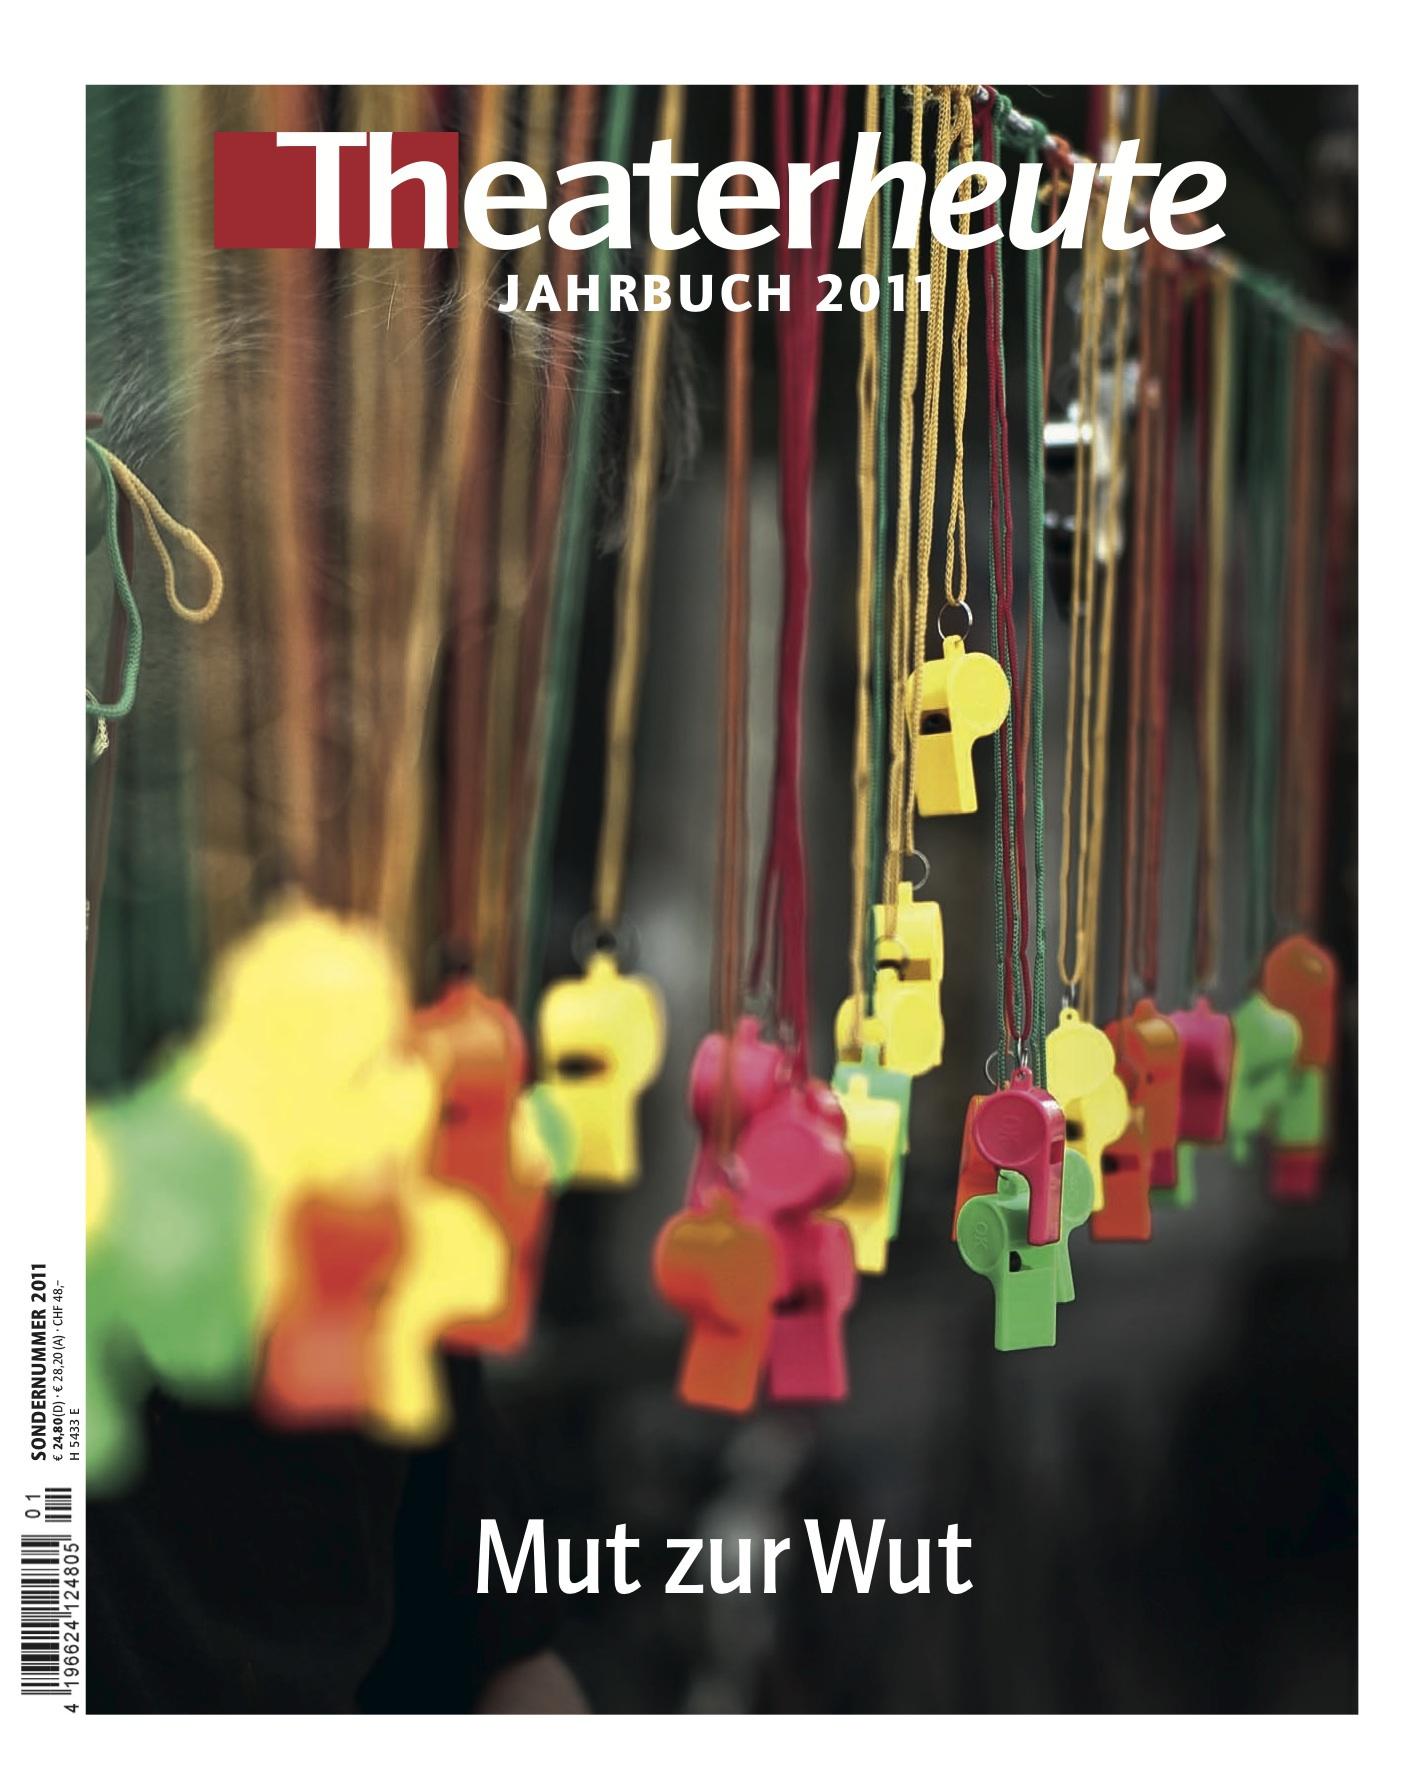 Theater heute Jahrbuch (13/2011)